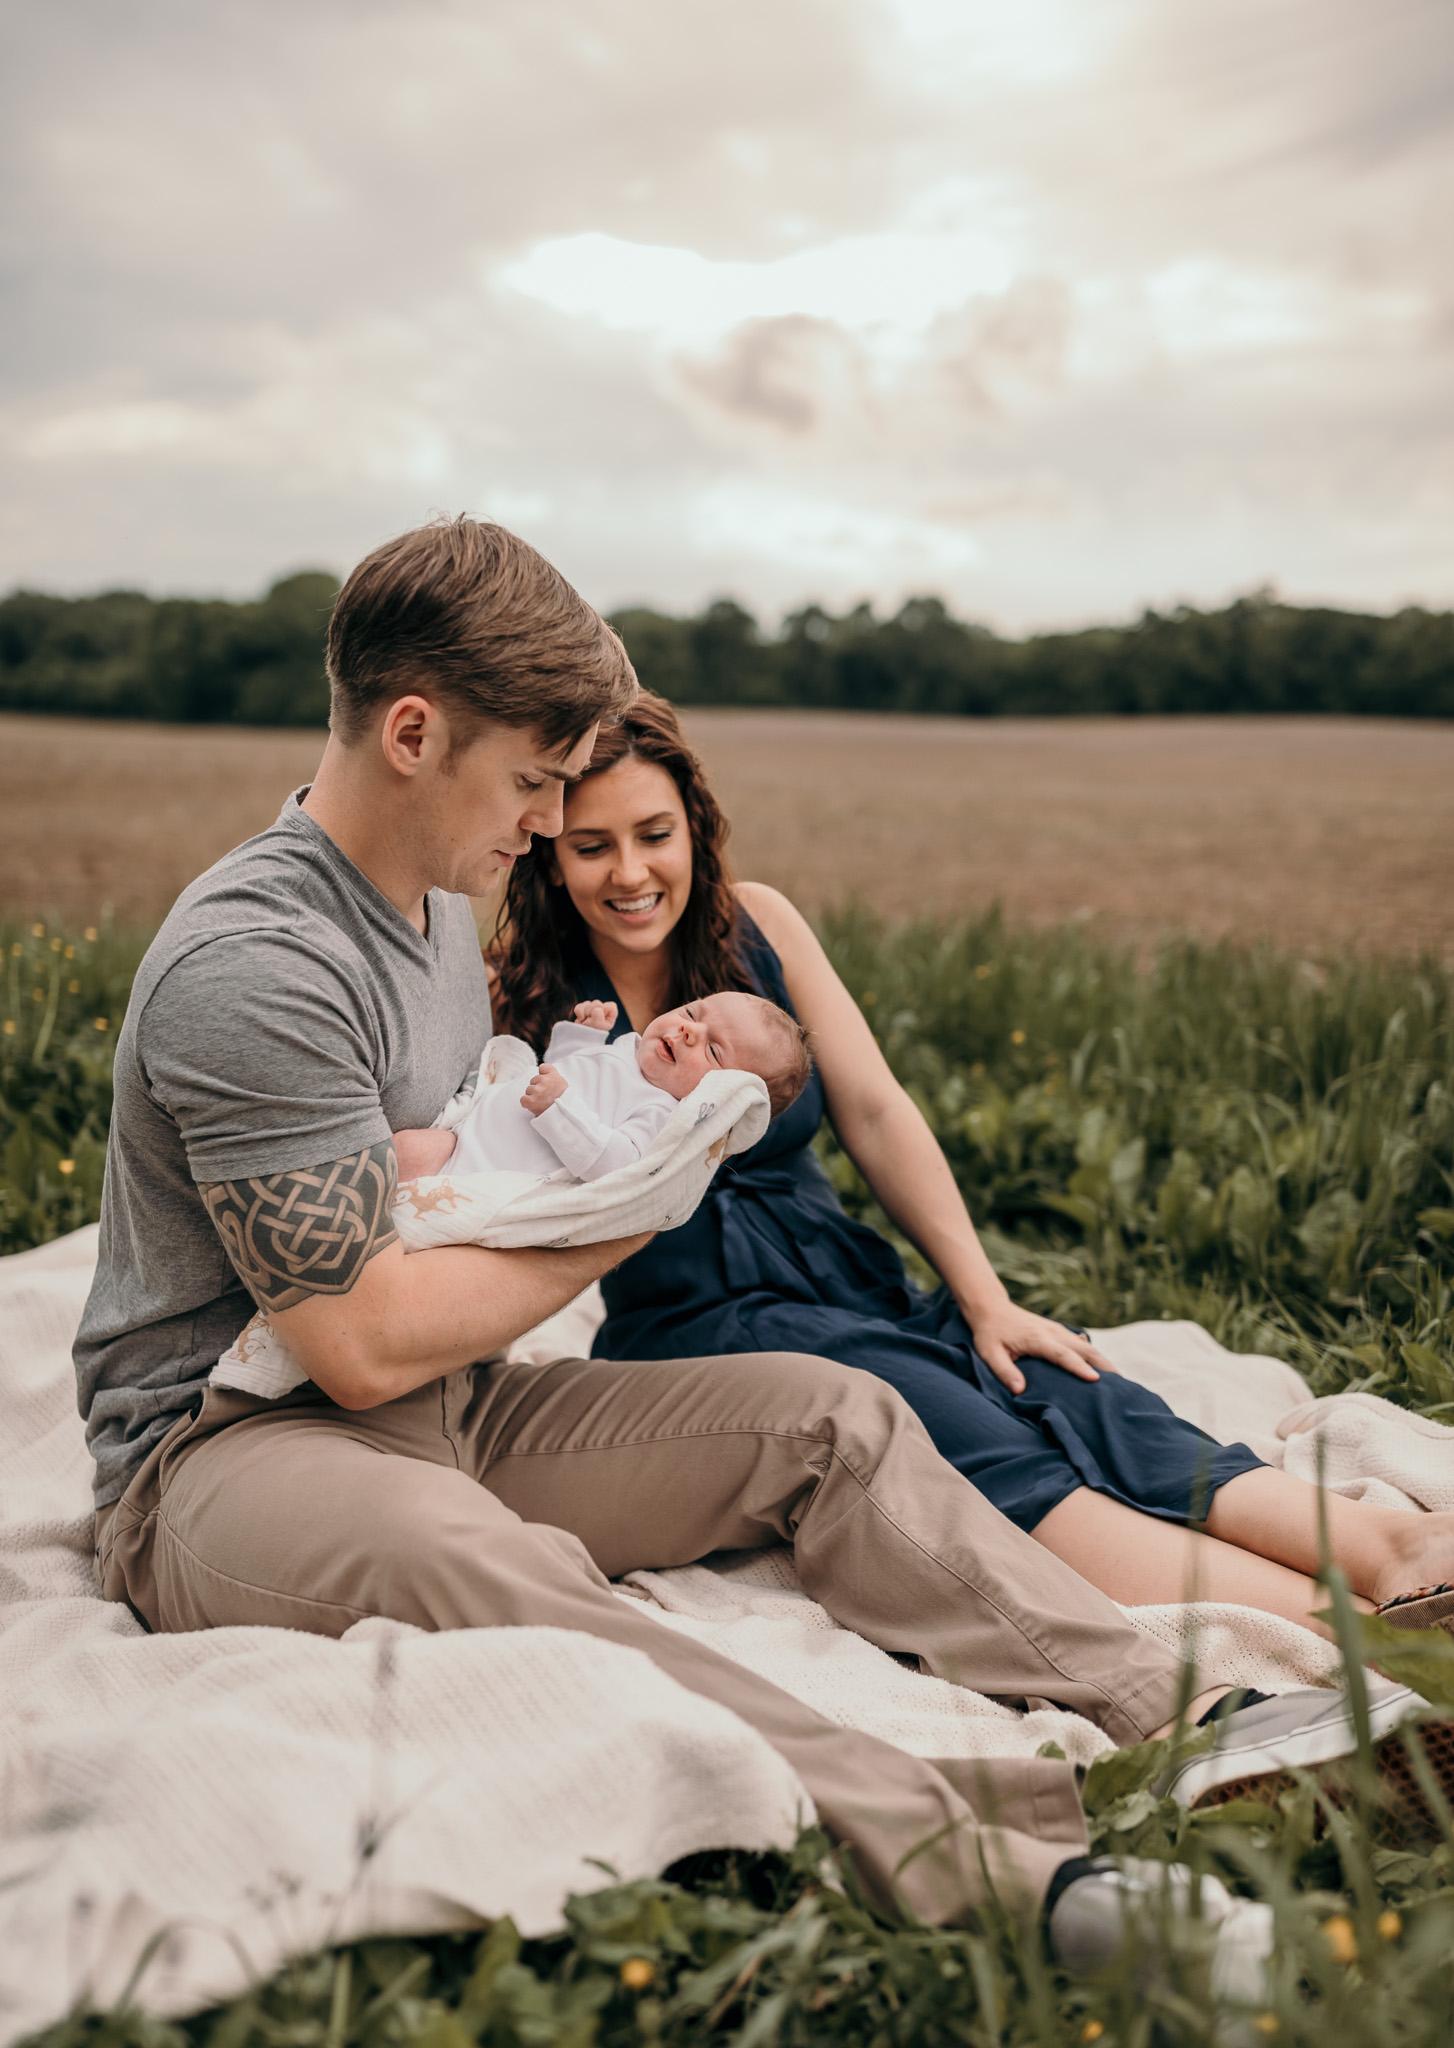 newborn photos outside